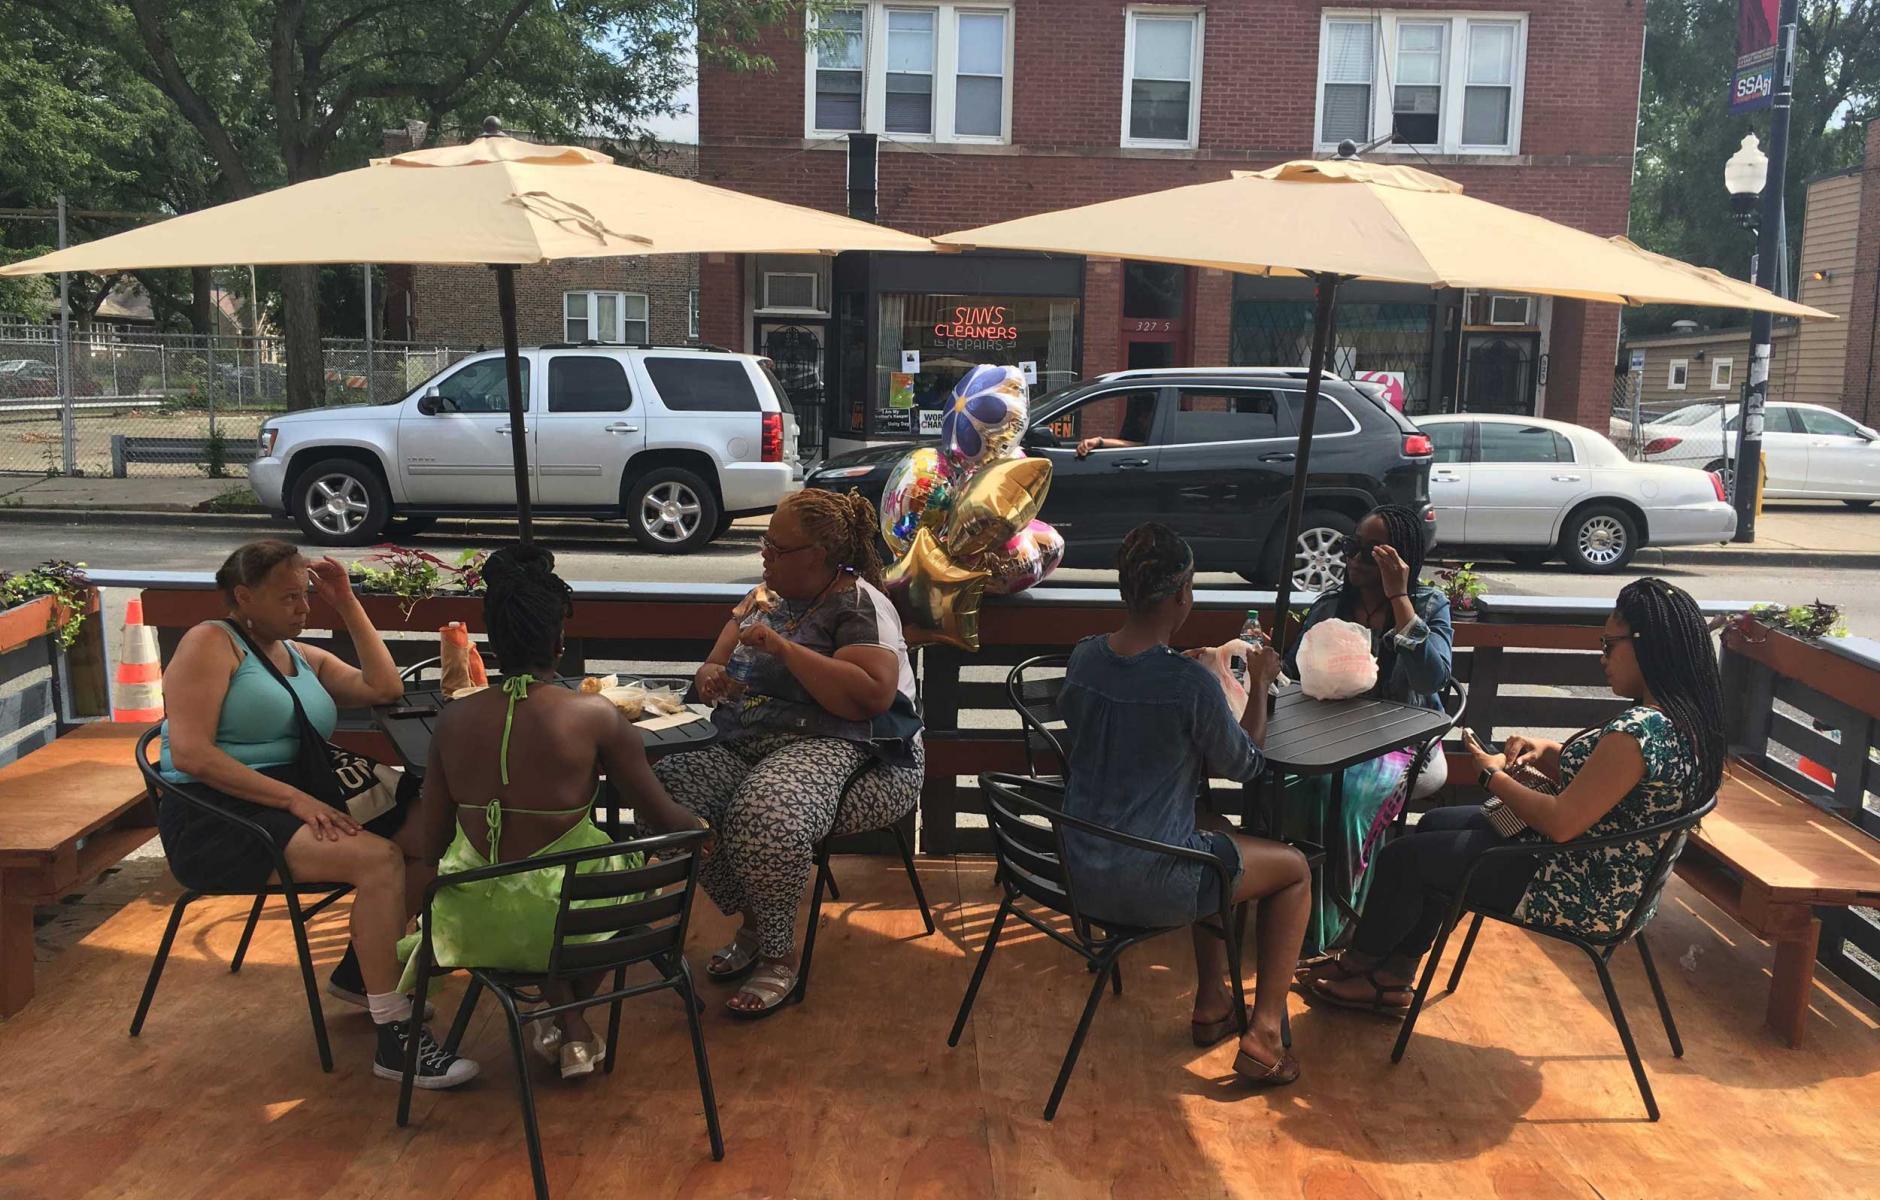 Article image for Parklets transform Southside Chicago street